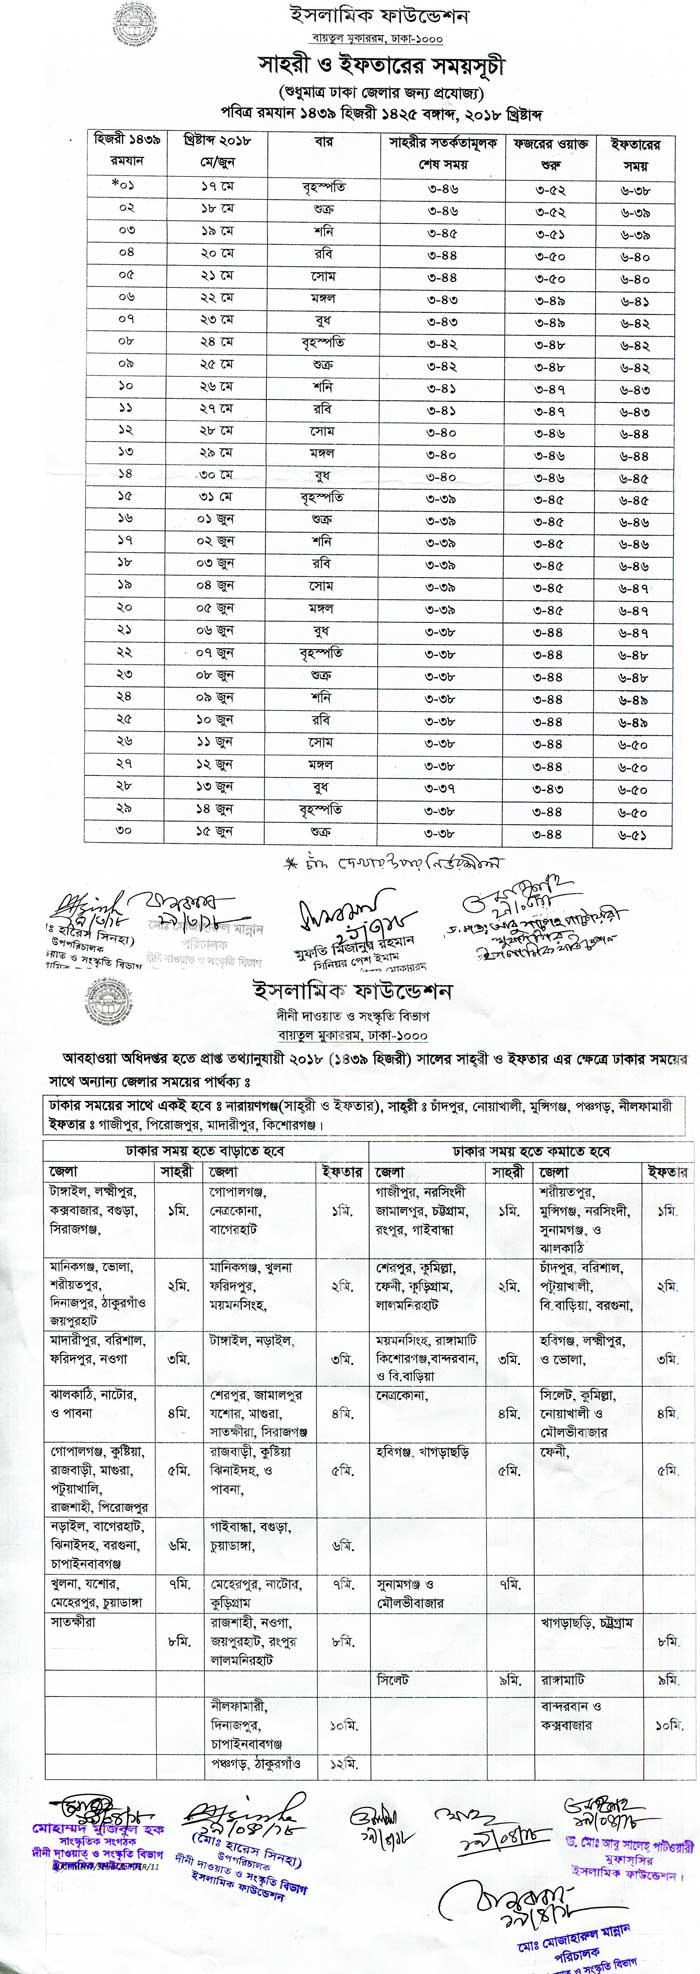 Ramadan Schedule 2018 Bangladesh Sehri Iftar Timings 1439